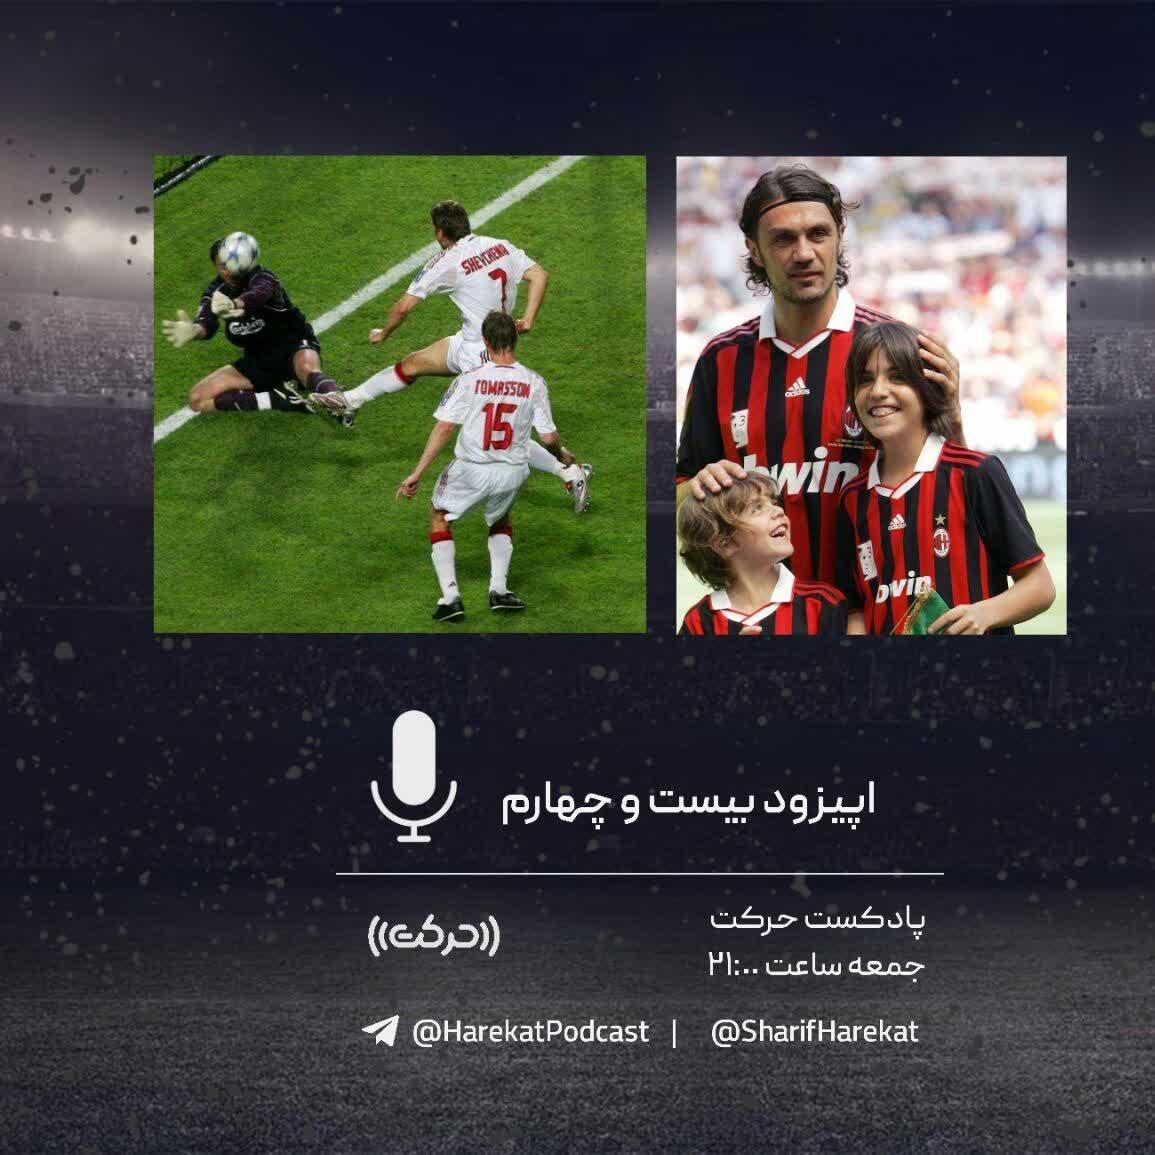 Episode 24 Harekat